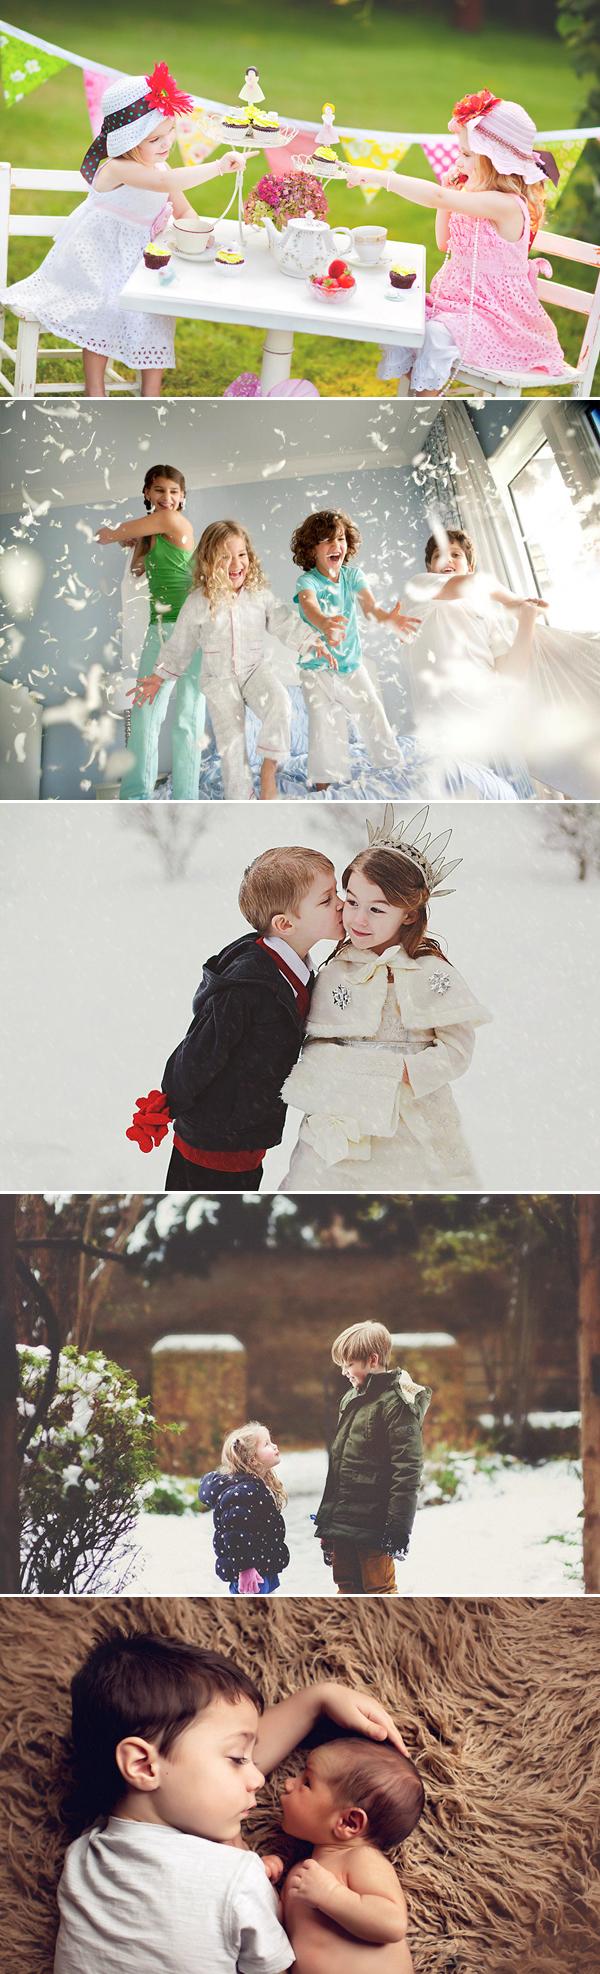 children photography 01